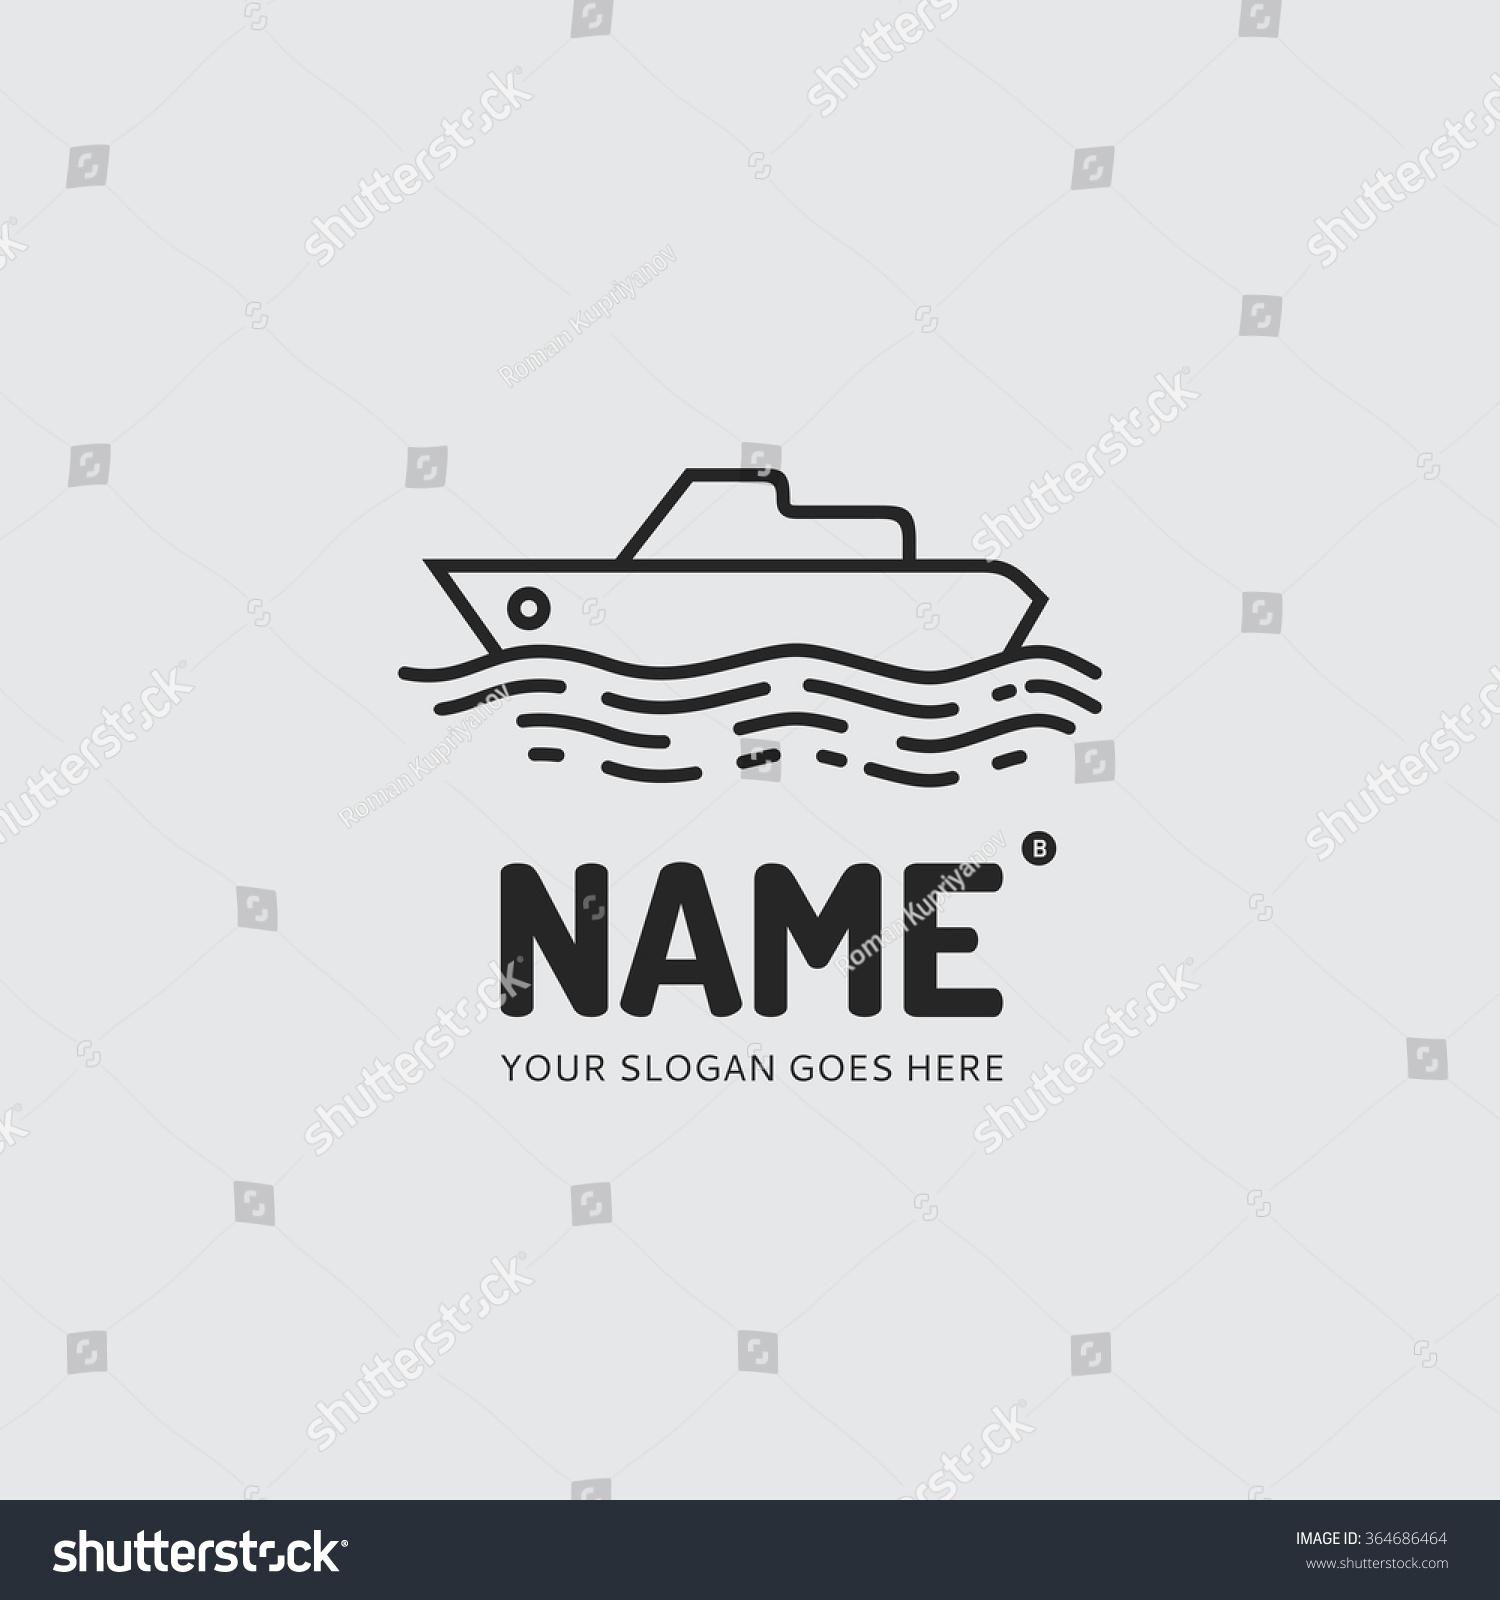 Ship logo design vector template symbol stock vector 364686464 ship logo design vector template symbol concept icon buycottarizona